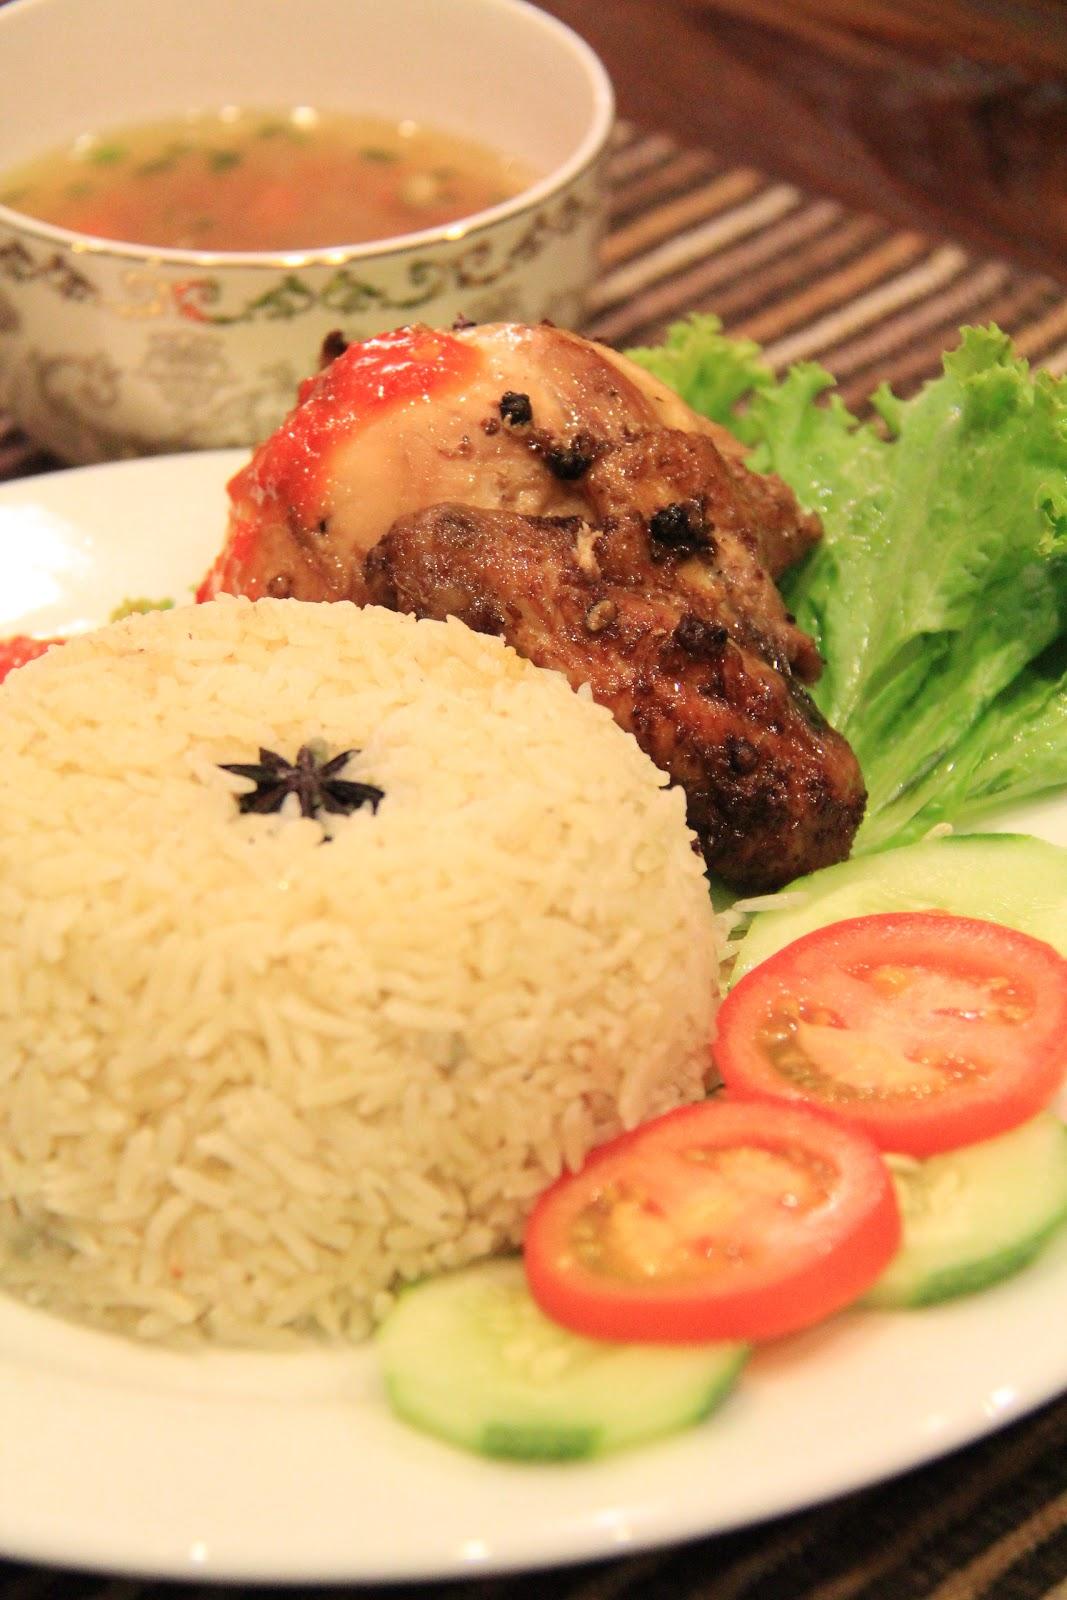 Bersama Kak Dee - Resepi Nasi Ayam ( Nasi & Ayam)